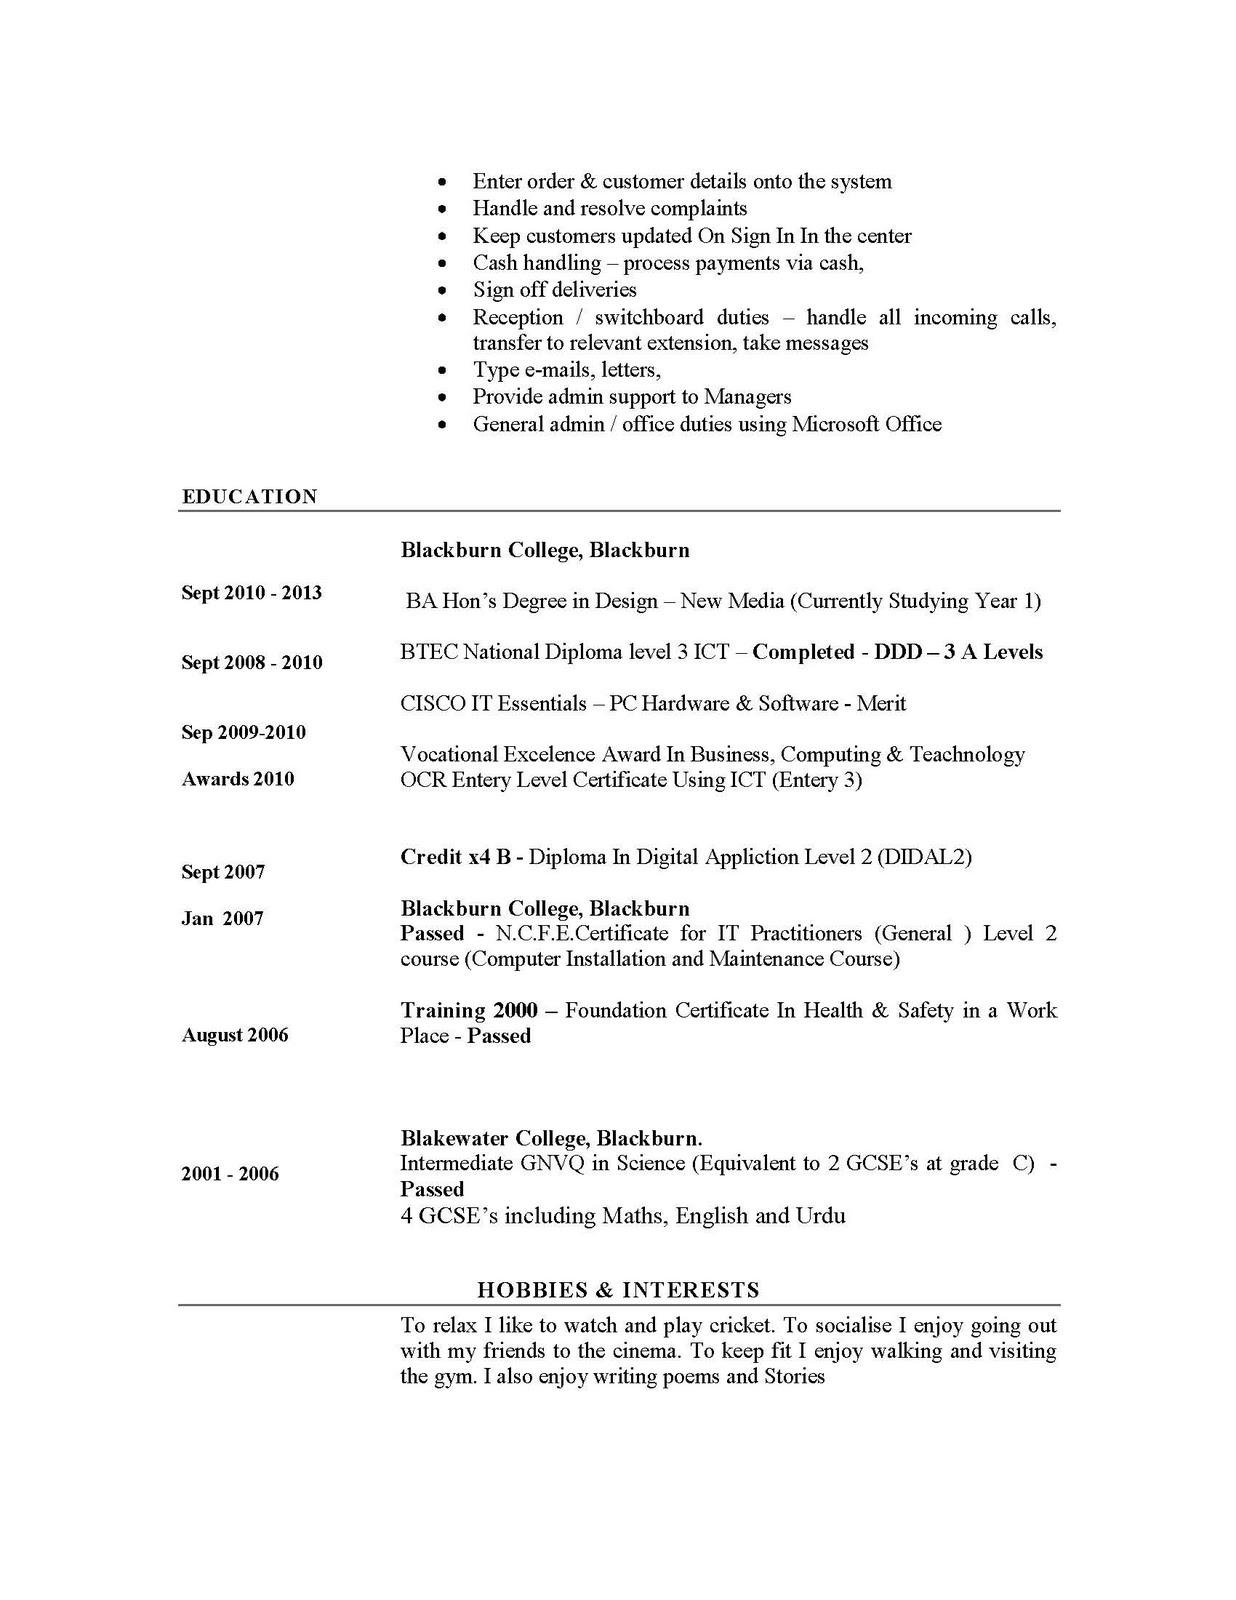 curriculum vitae ahpra